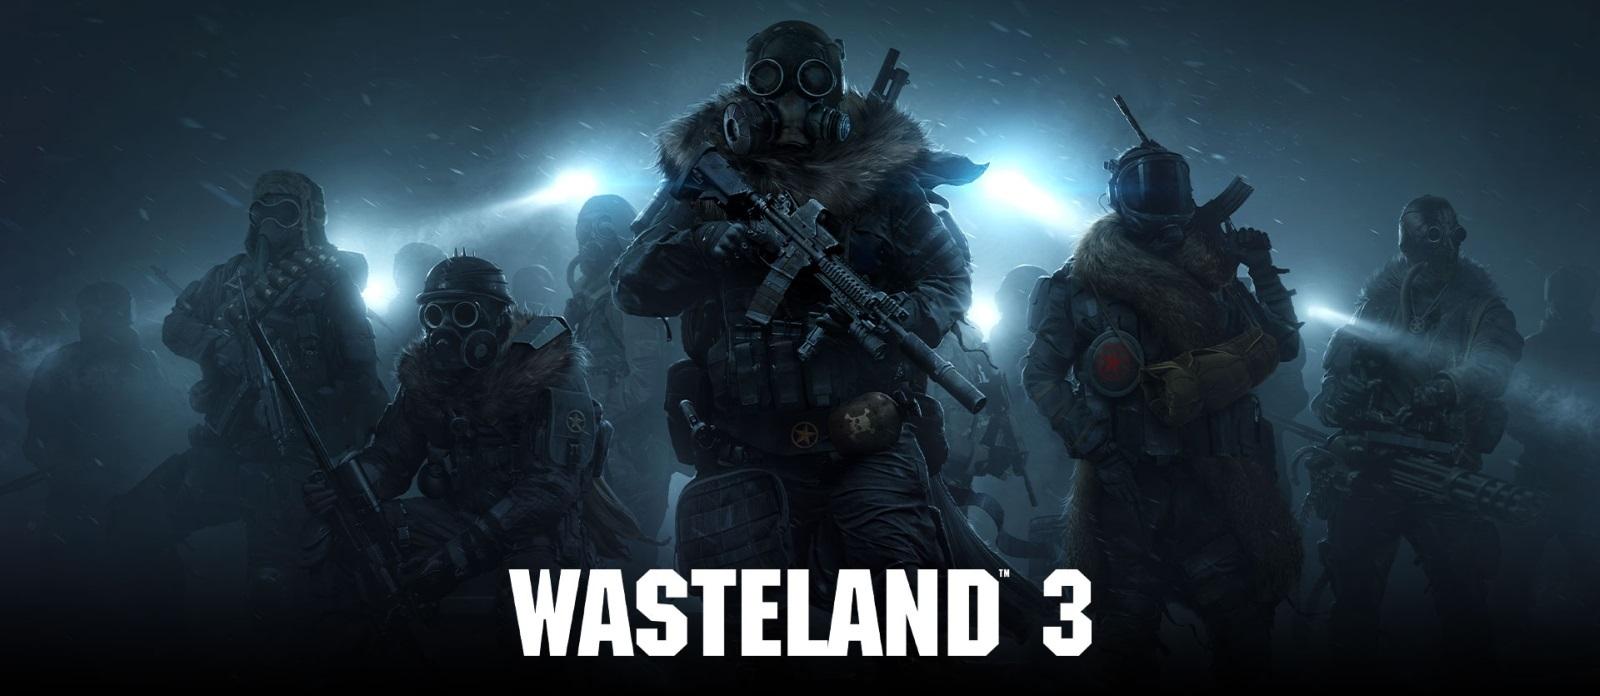 Wasteland 3; screenshot: cover